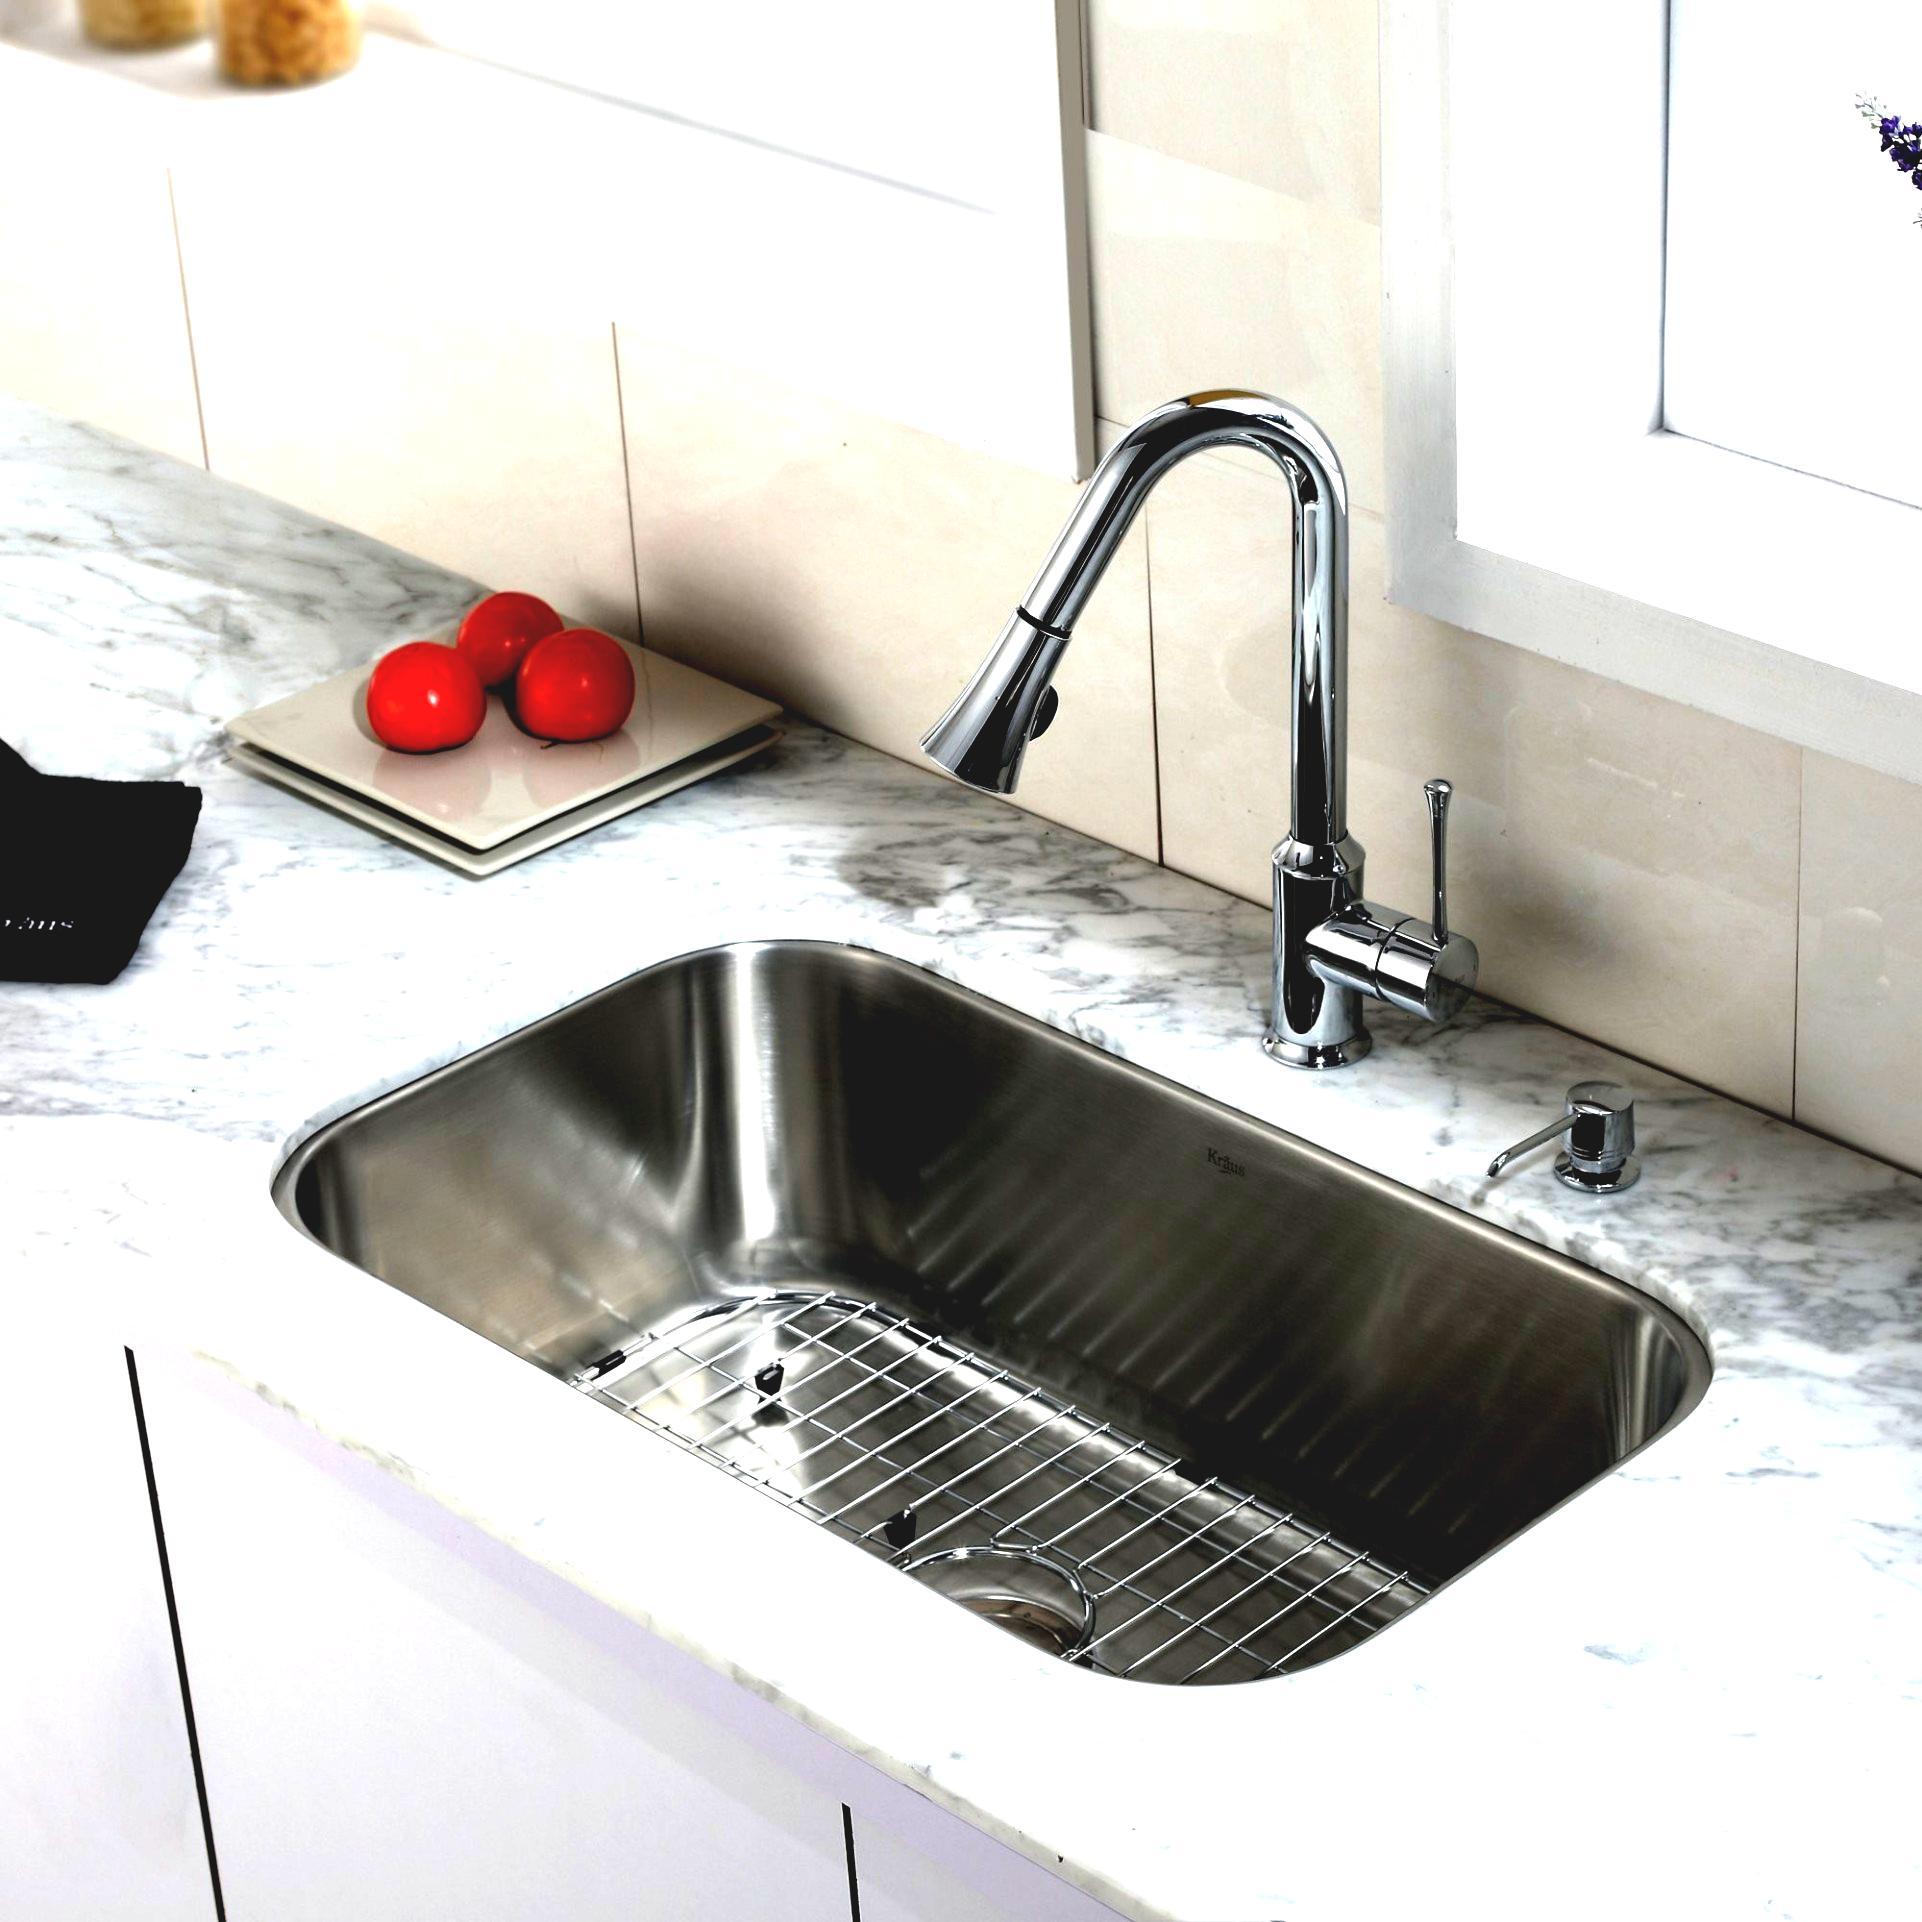 black granite sink and faucet photo - 8